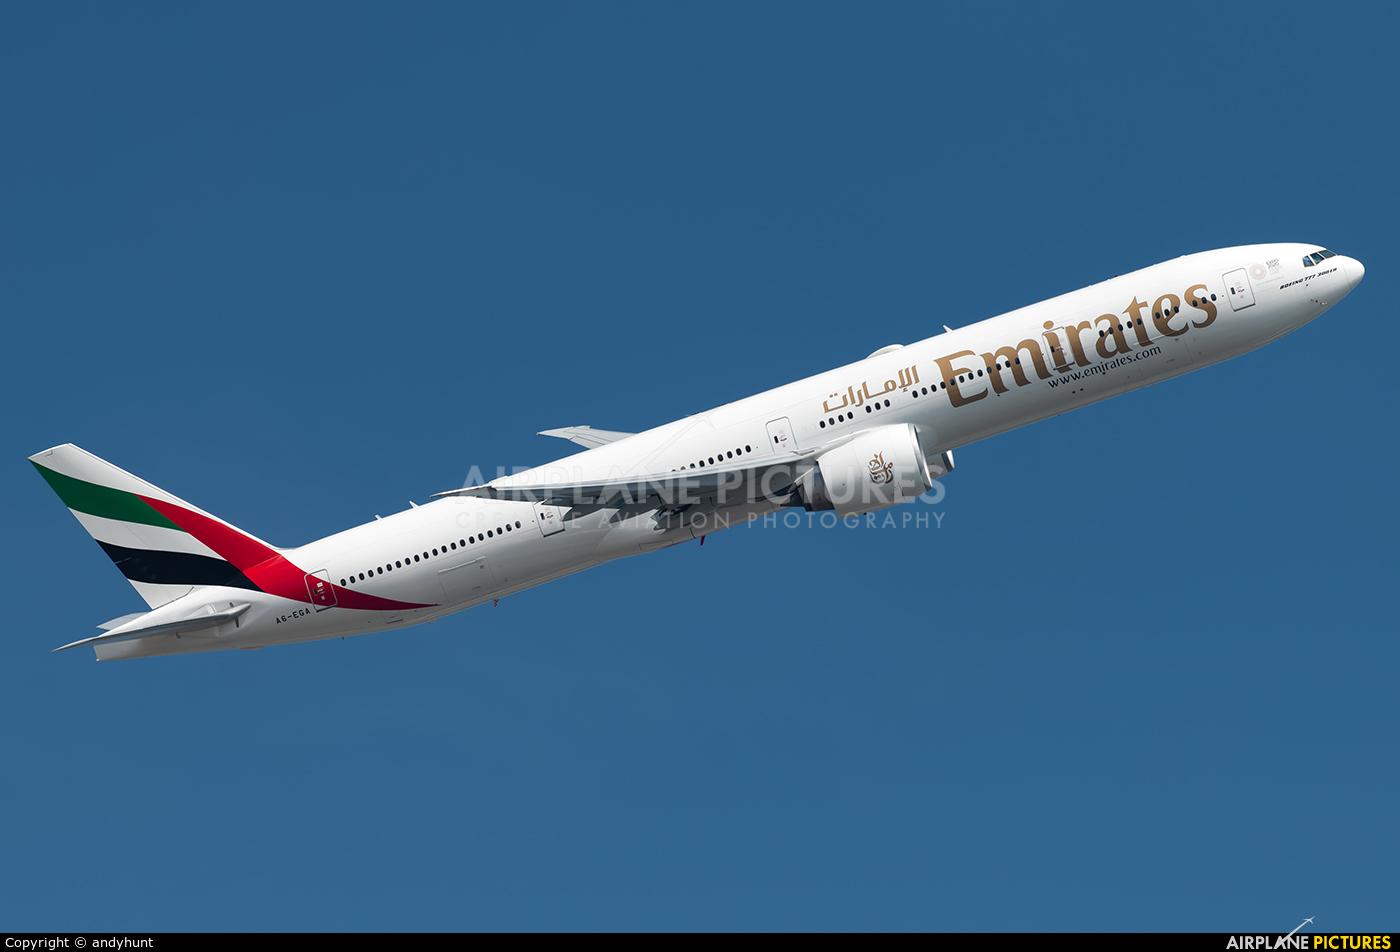 Emirates Airlines A6-EGA aircraft at Singapore - Changi